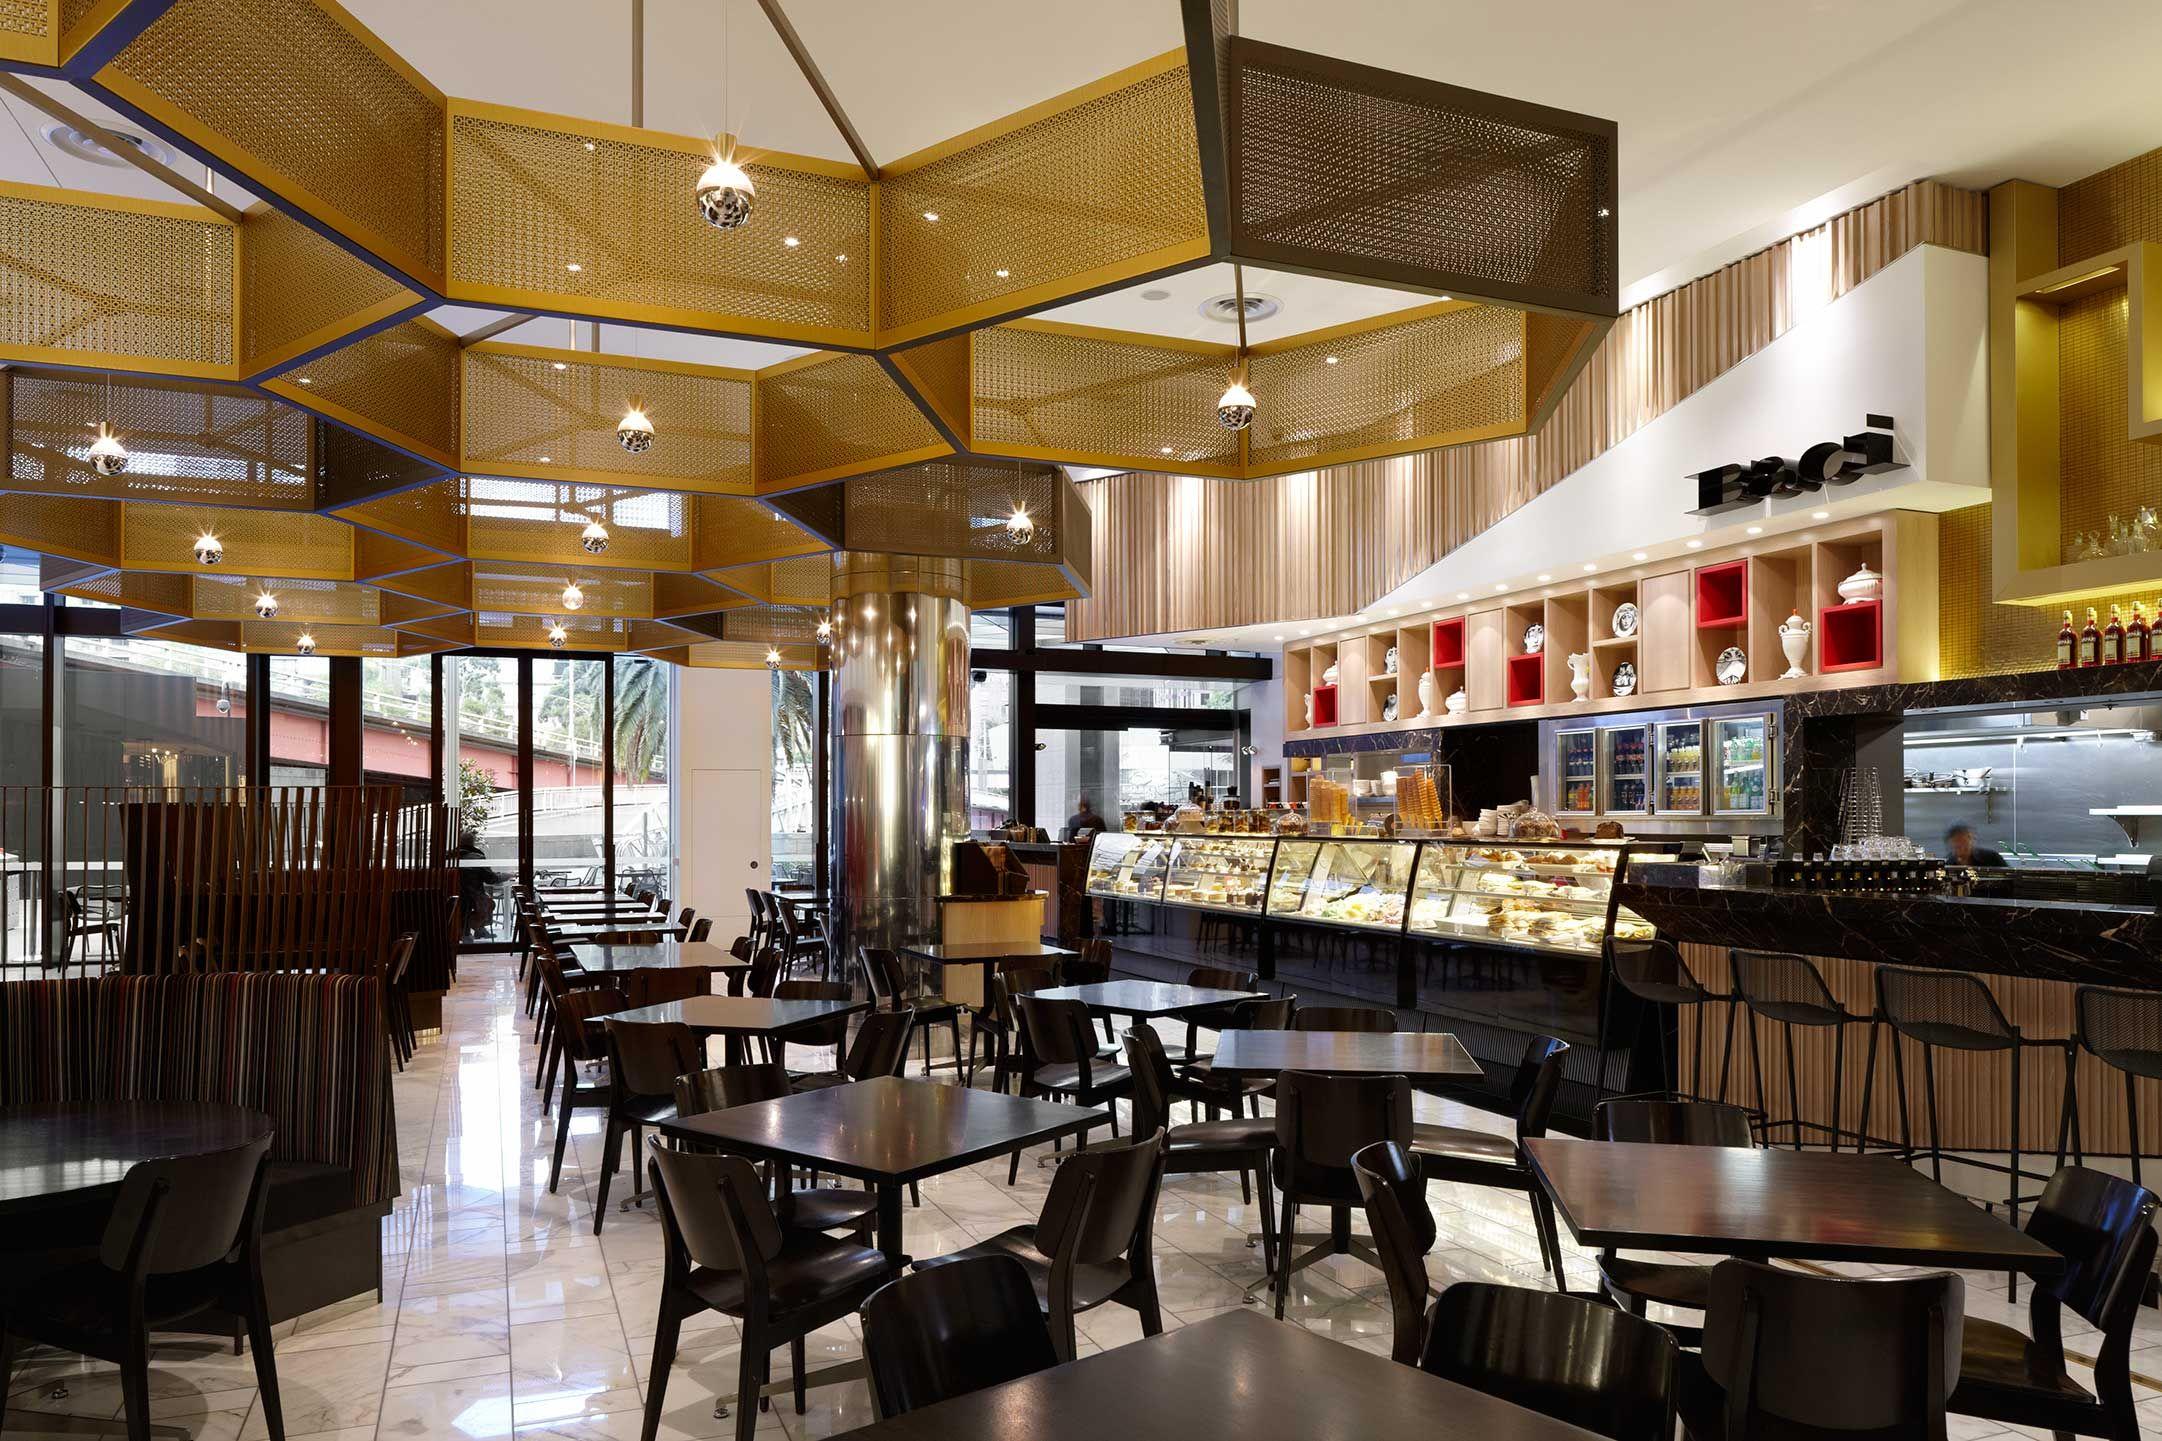 Simple Cafe Interior Design - Google Search